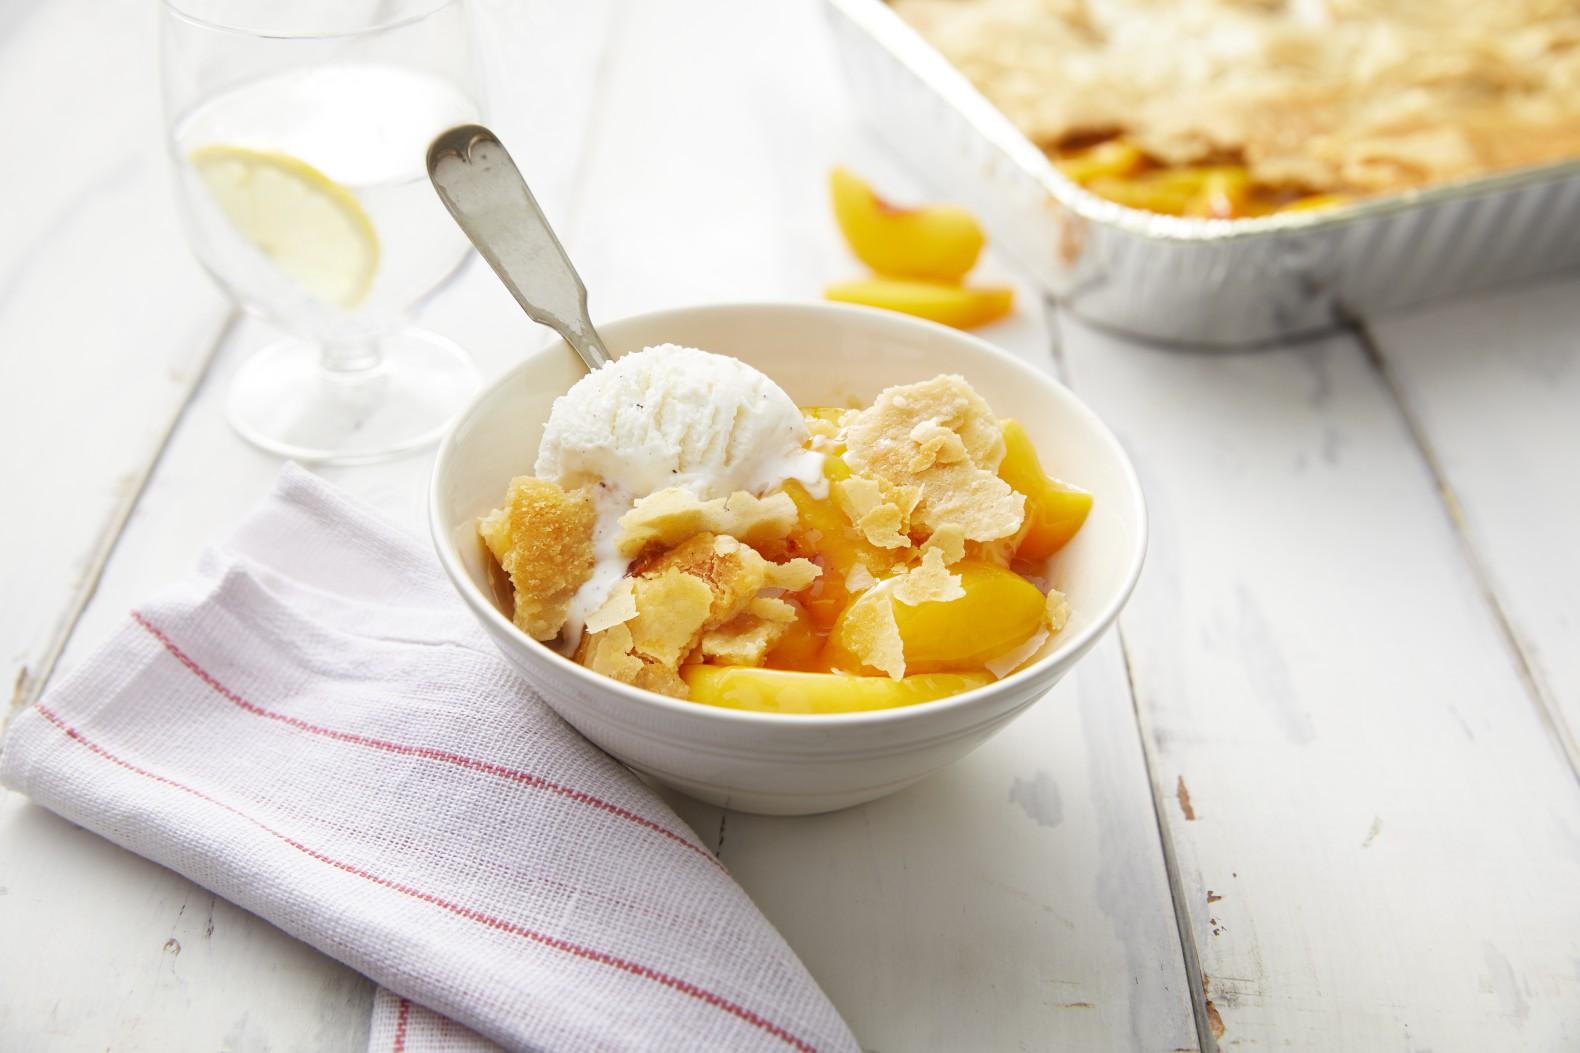 mrs_smith_s_classic_5_lb_ready_to_bake_peach_cobbler-4001271